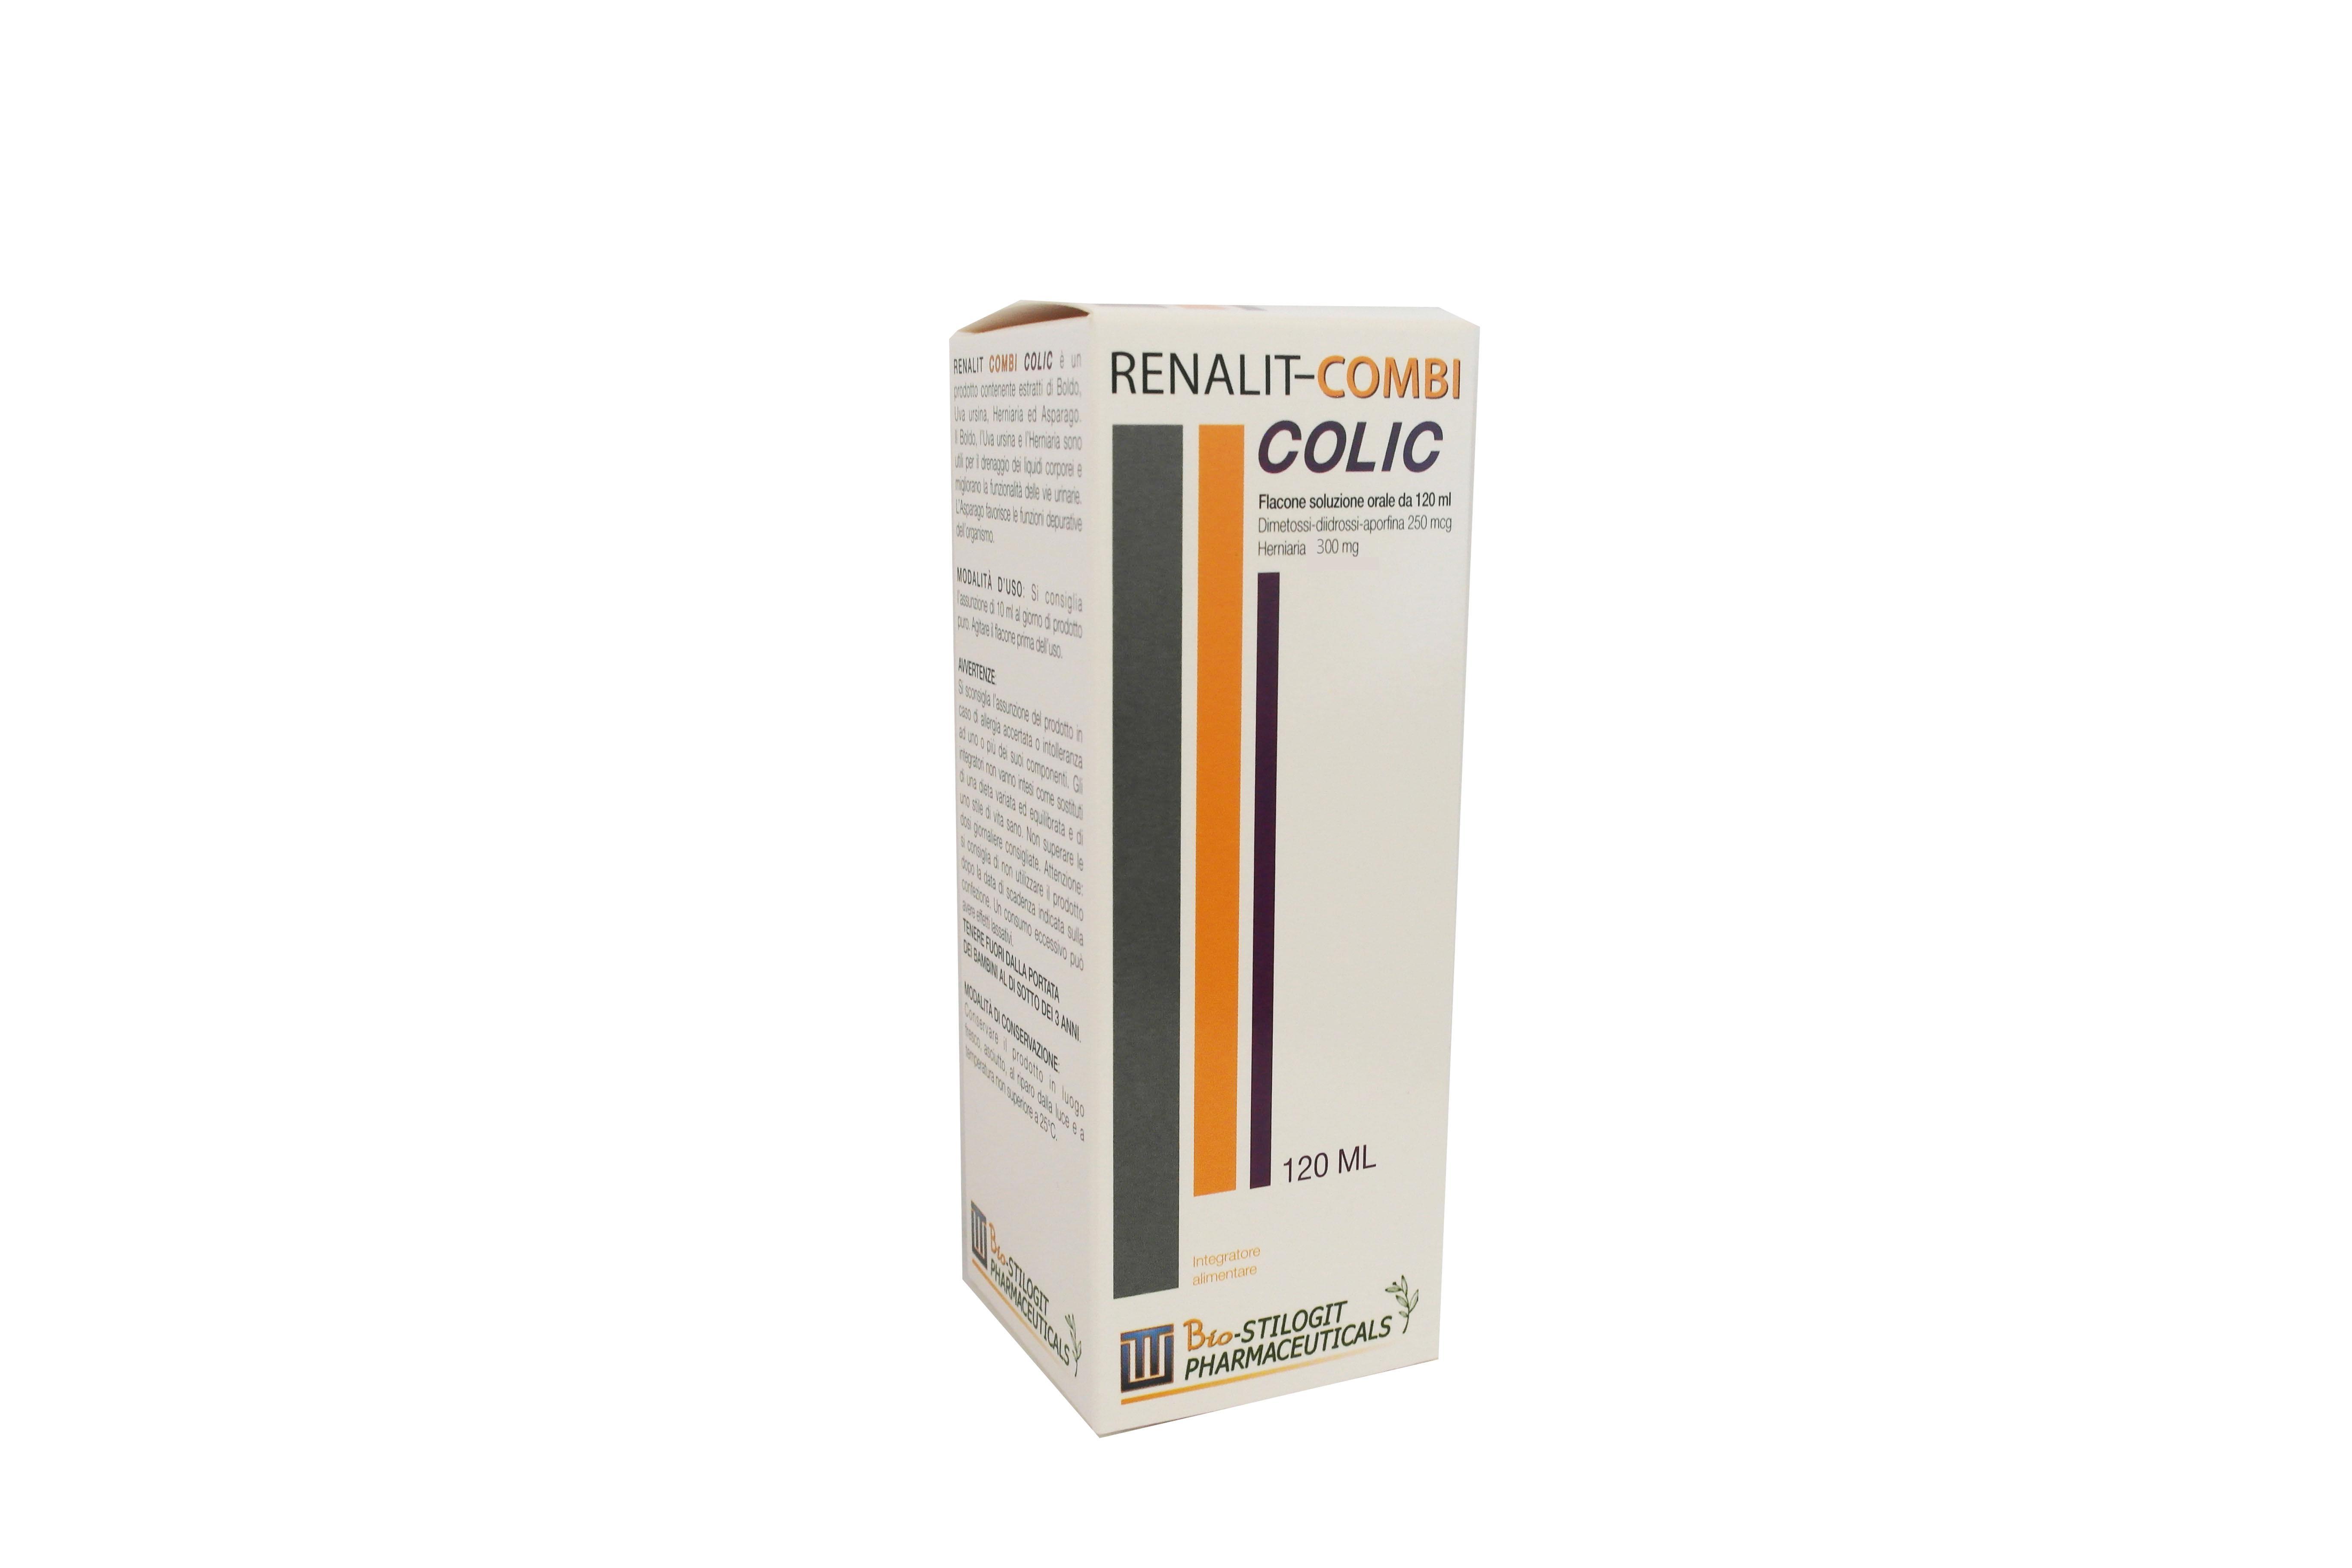 RENALIT-COMBI COLIC